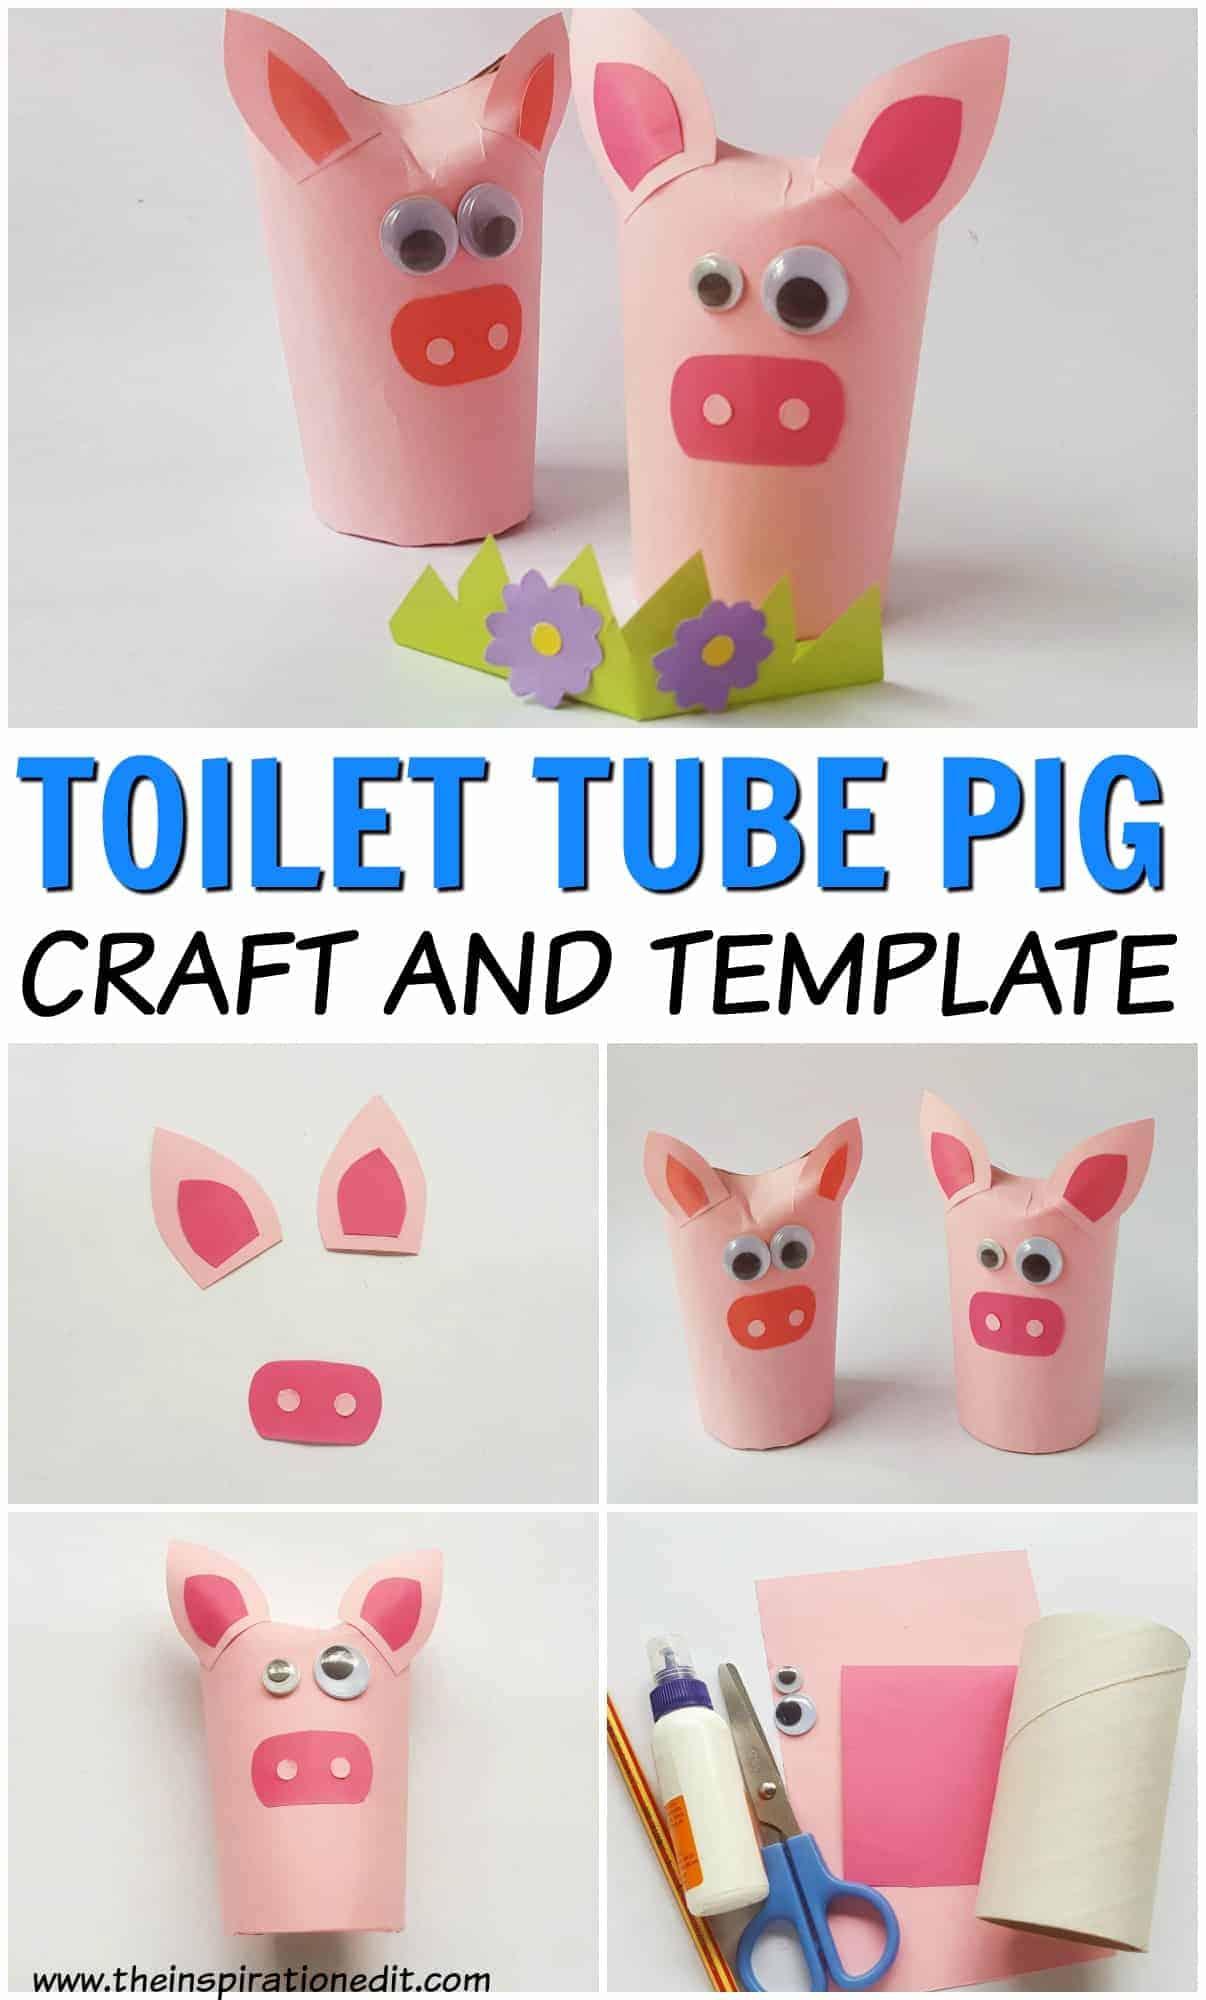 The Three Little Pigs Craft